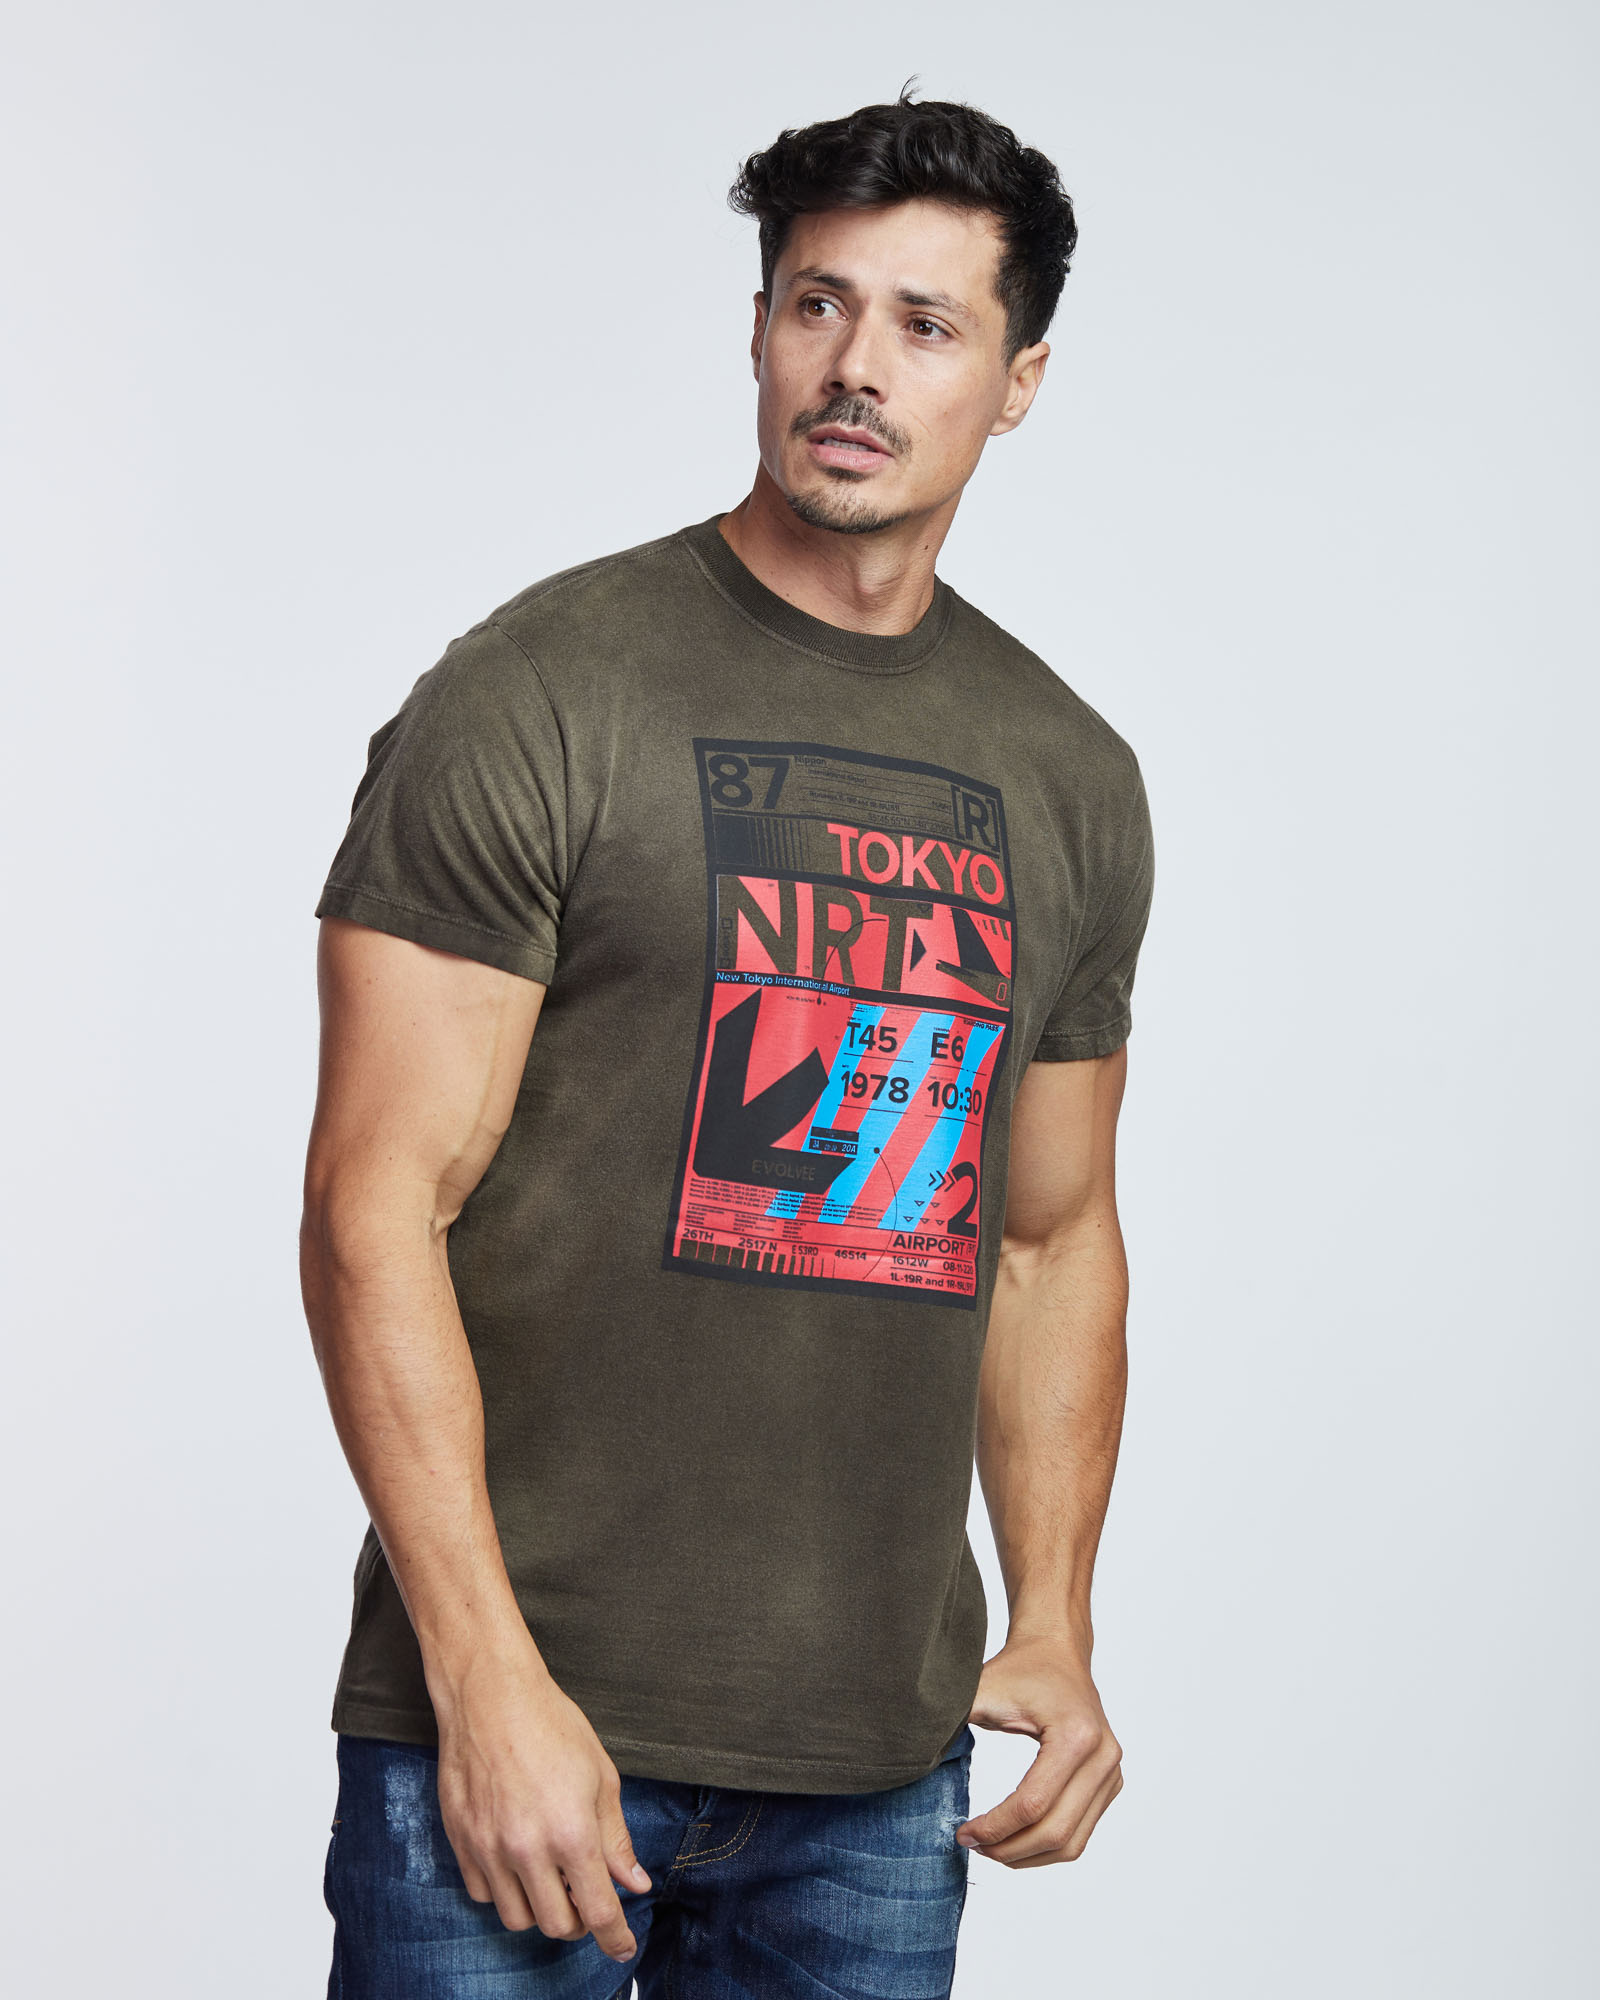 Camiseta Tokyo NRT Masculina Evolvee